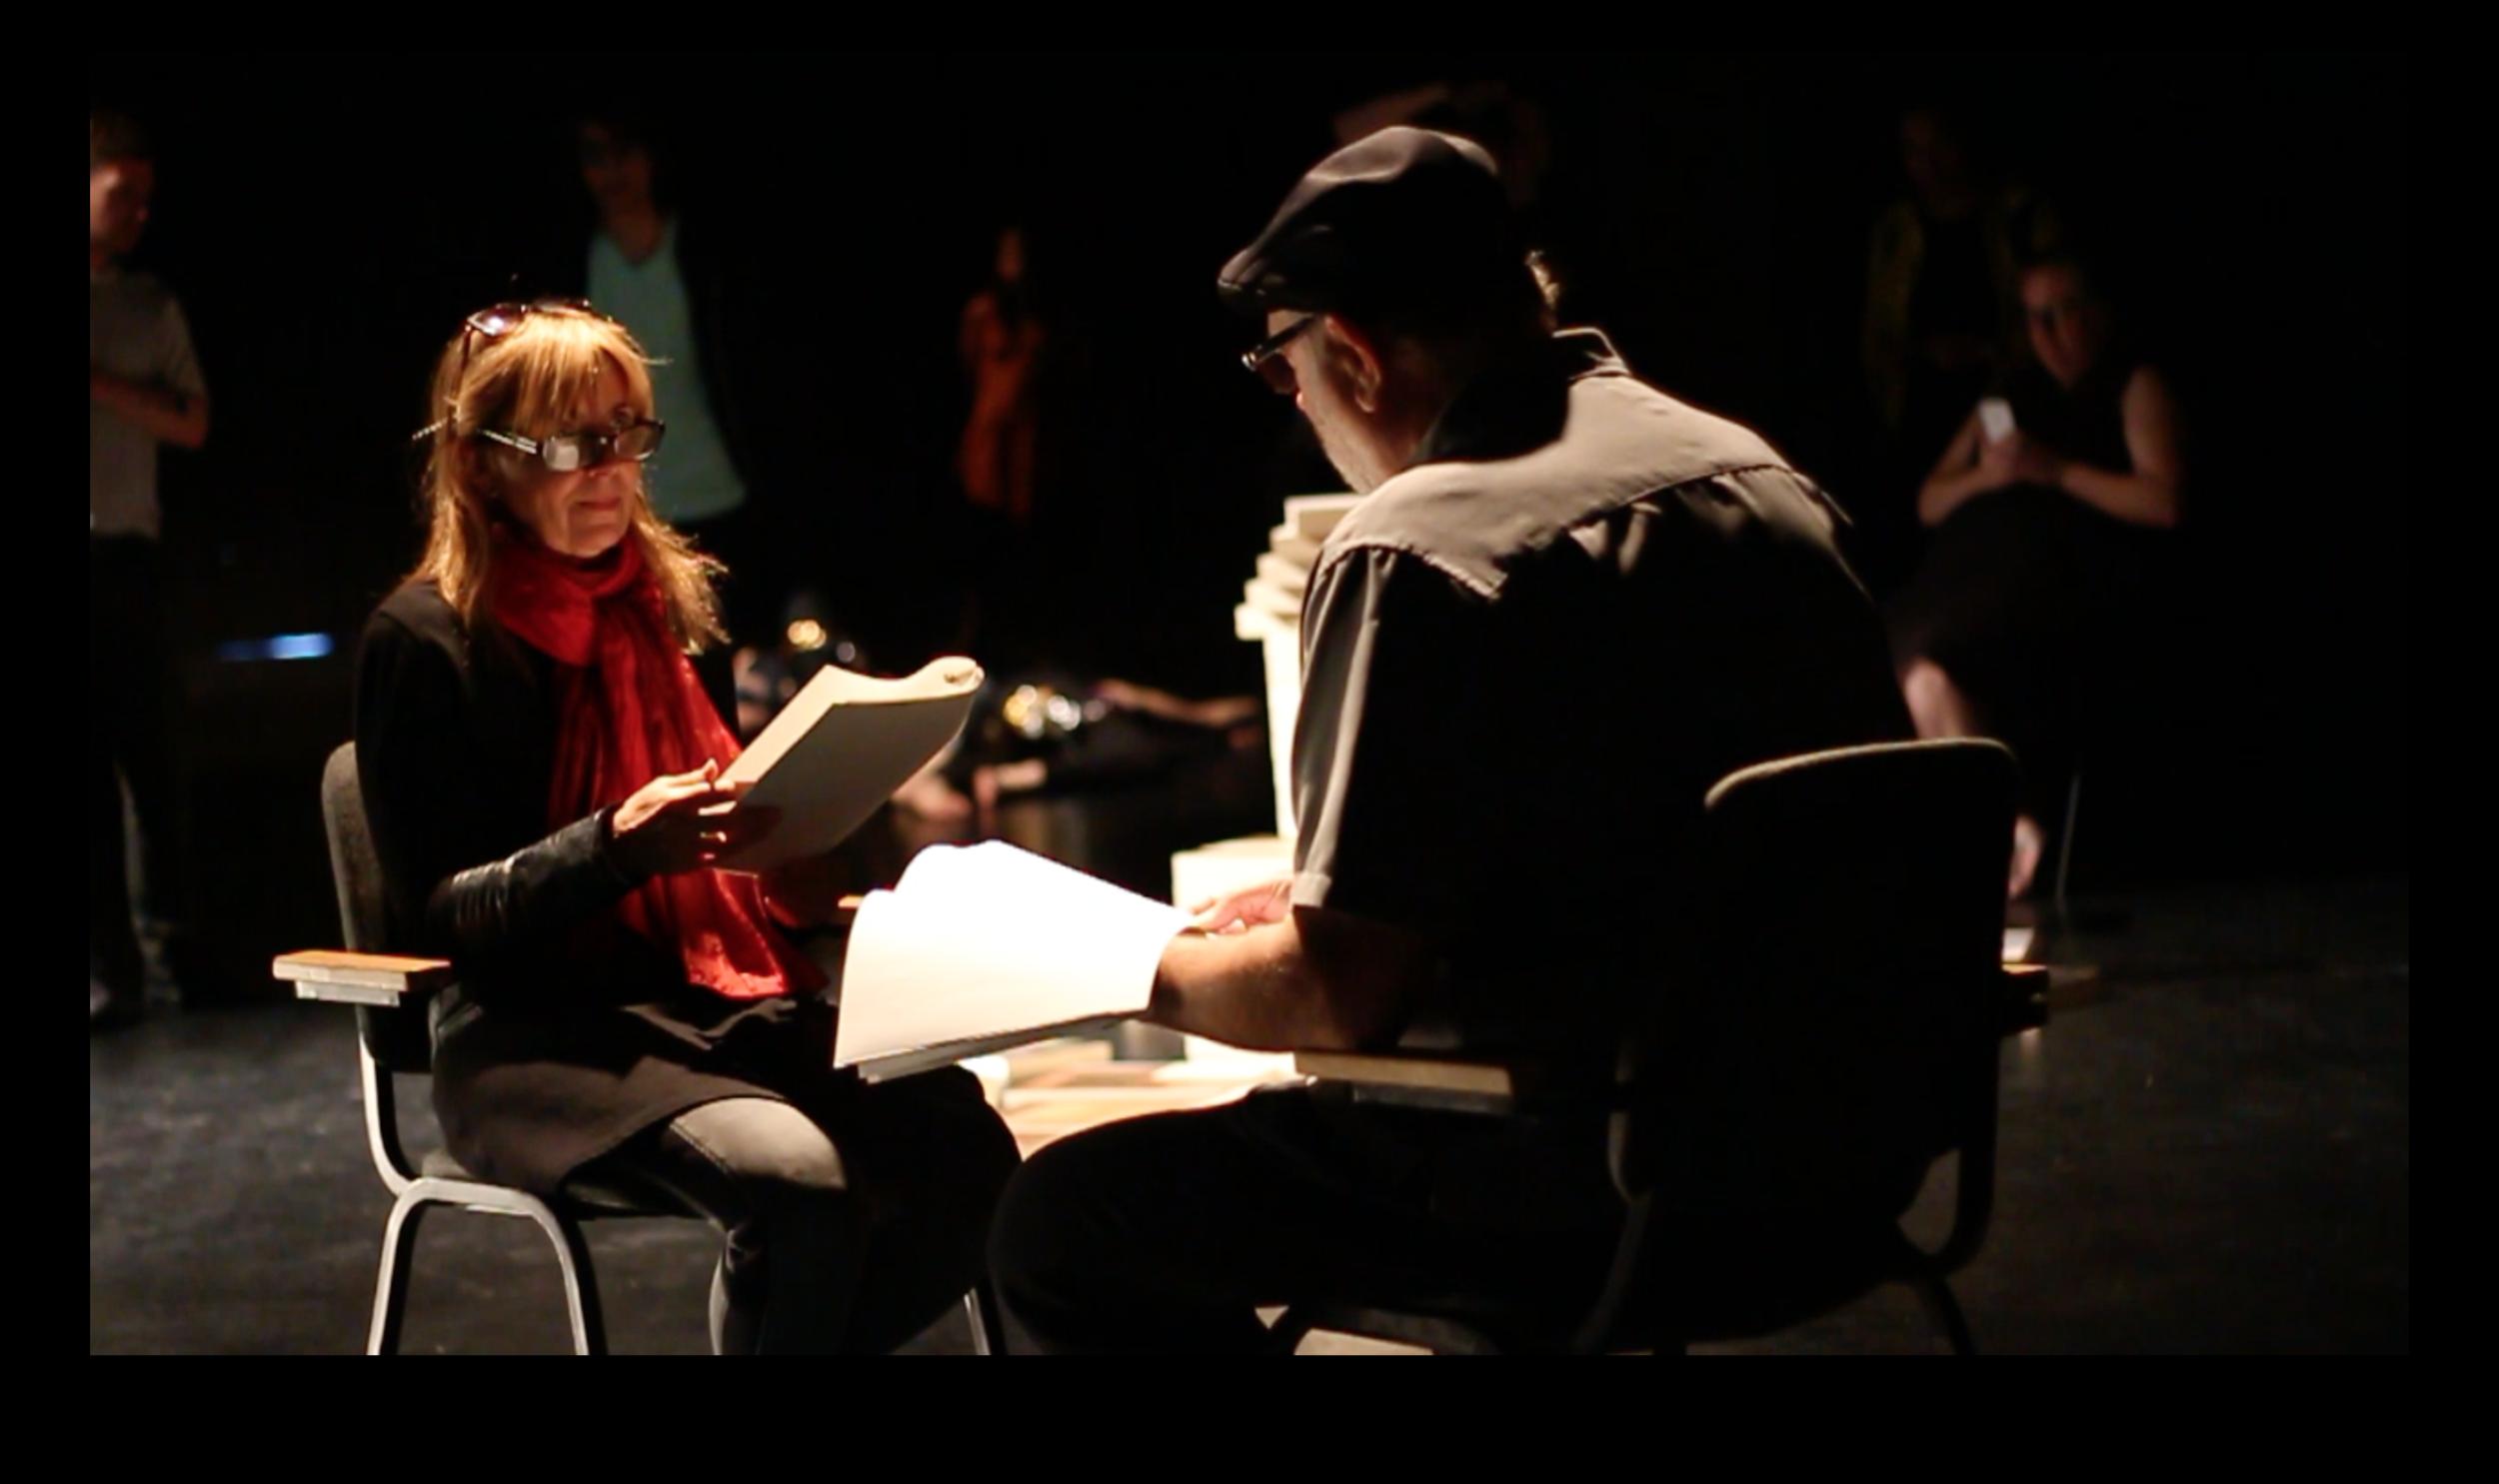 Copy of 'Scripts on Chairs' Abi Tariq